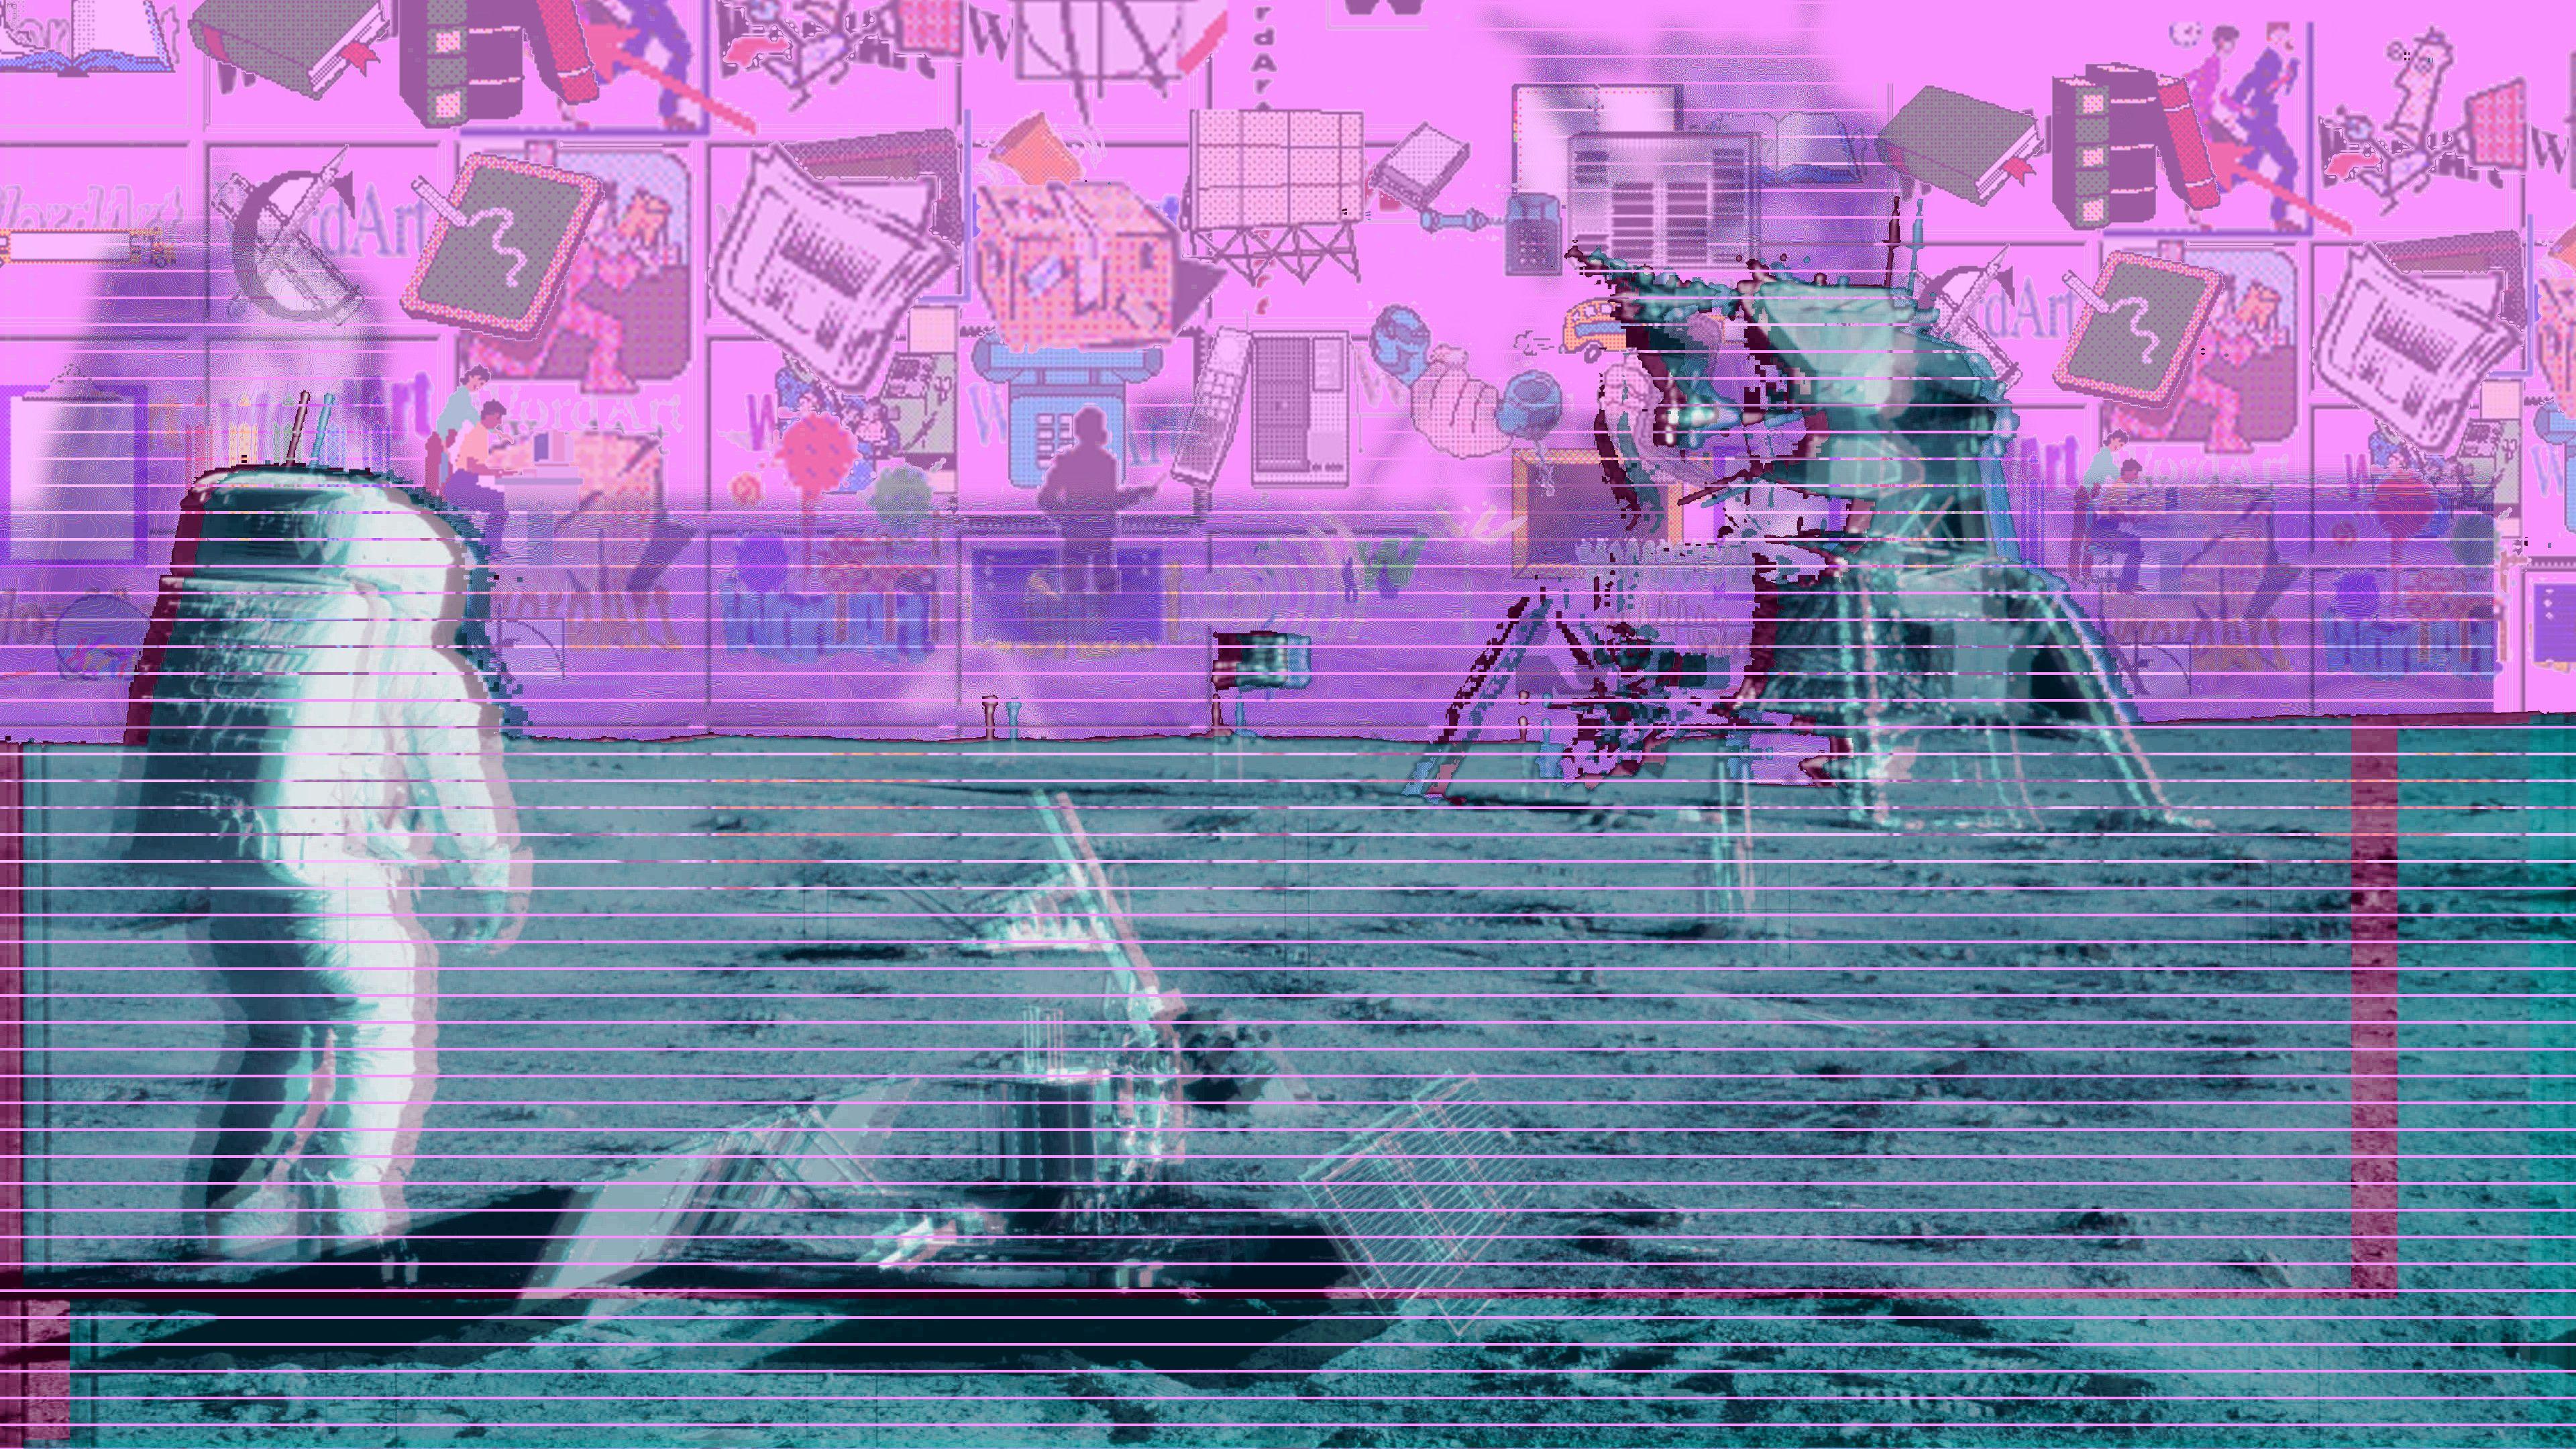 Vaporwave Wallpaper 2560x1600 ID57023 Vaporwave